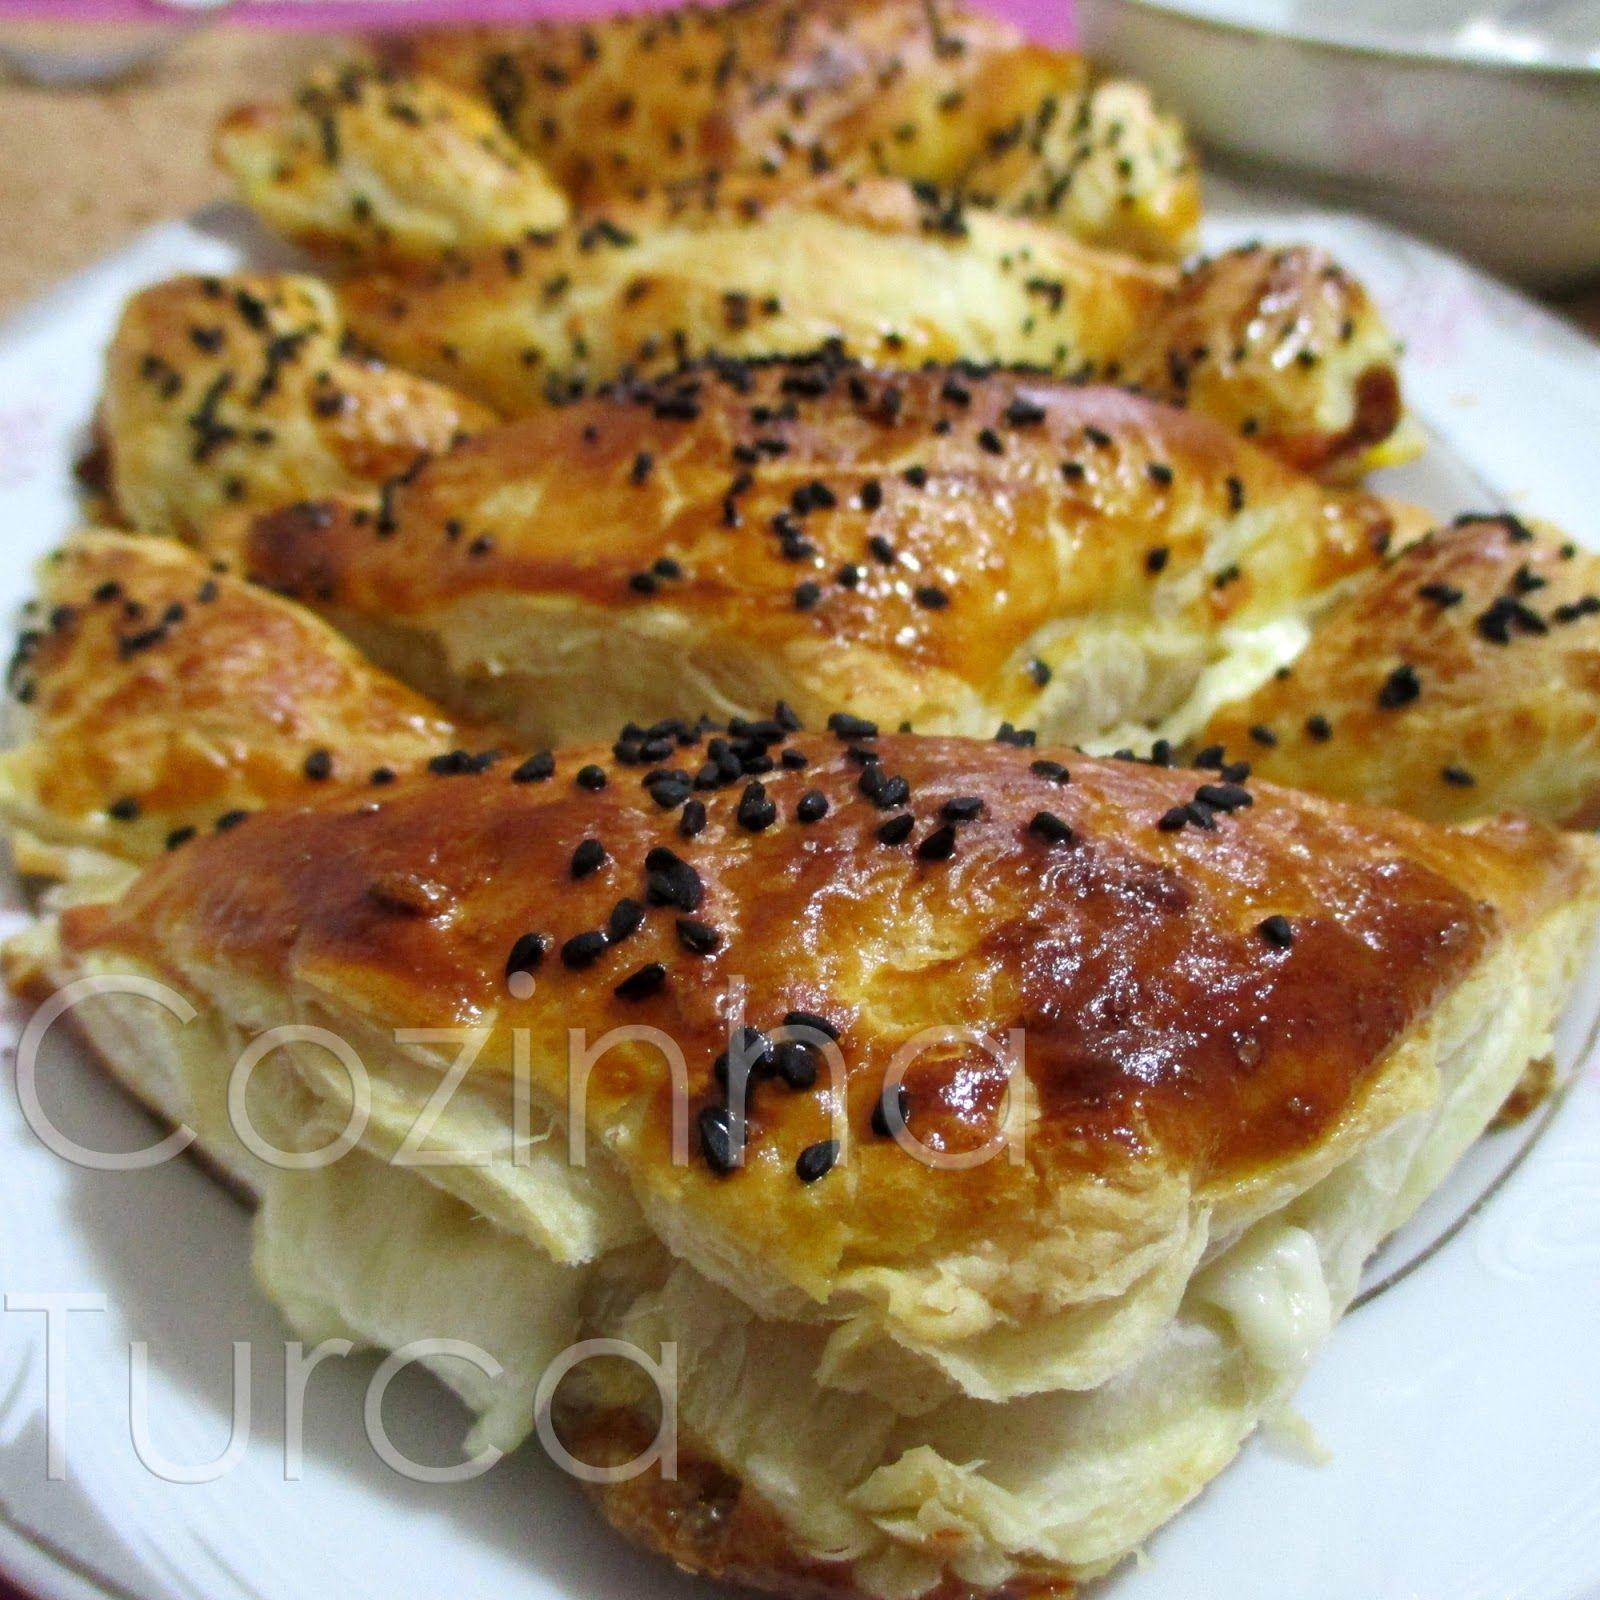 Cozinha Turca: Folhados de Queijo (Peynirli Milföy Börek)